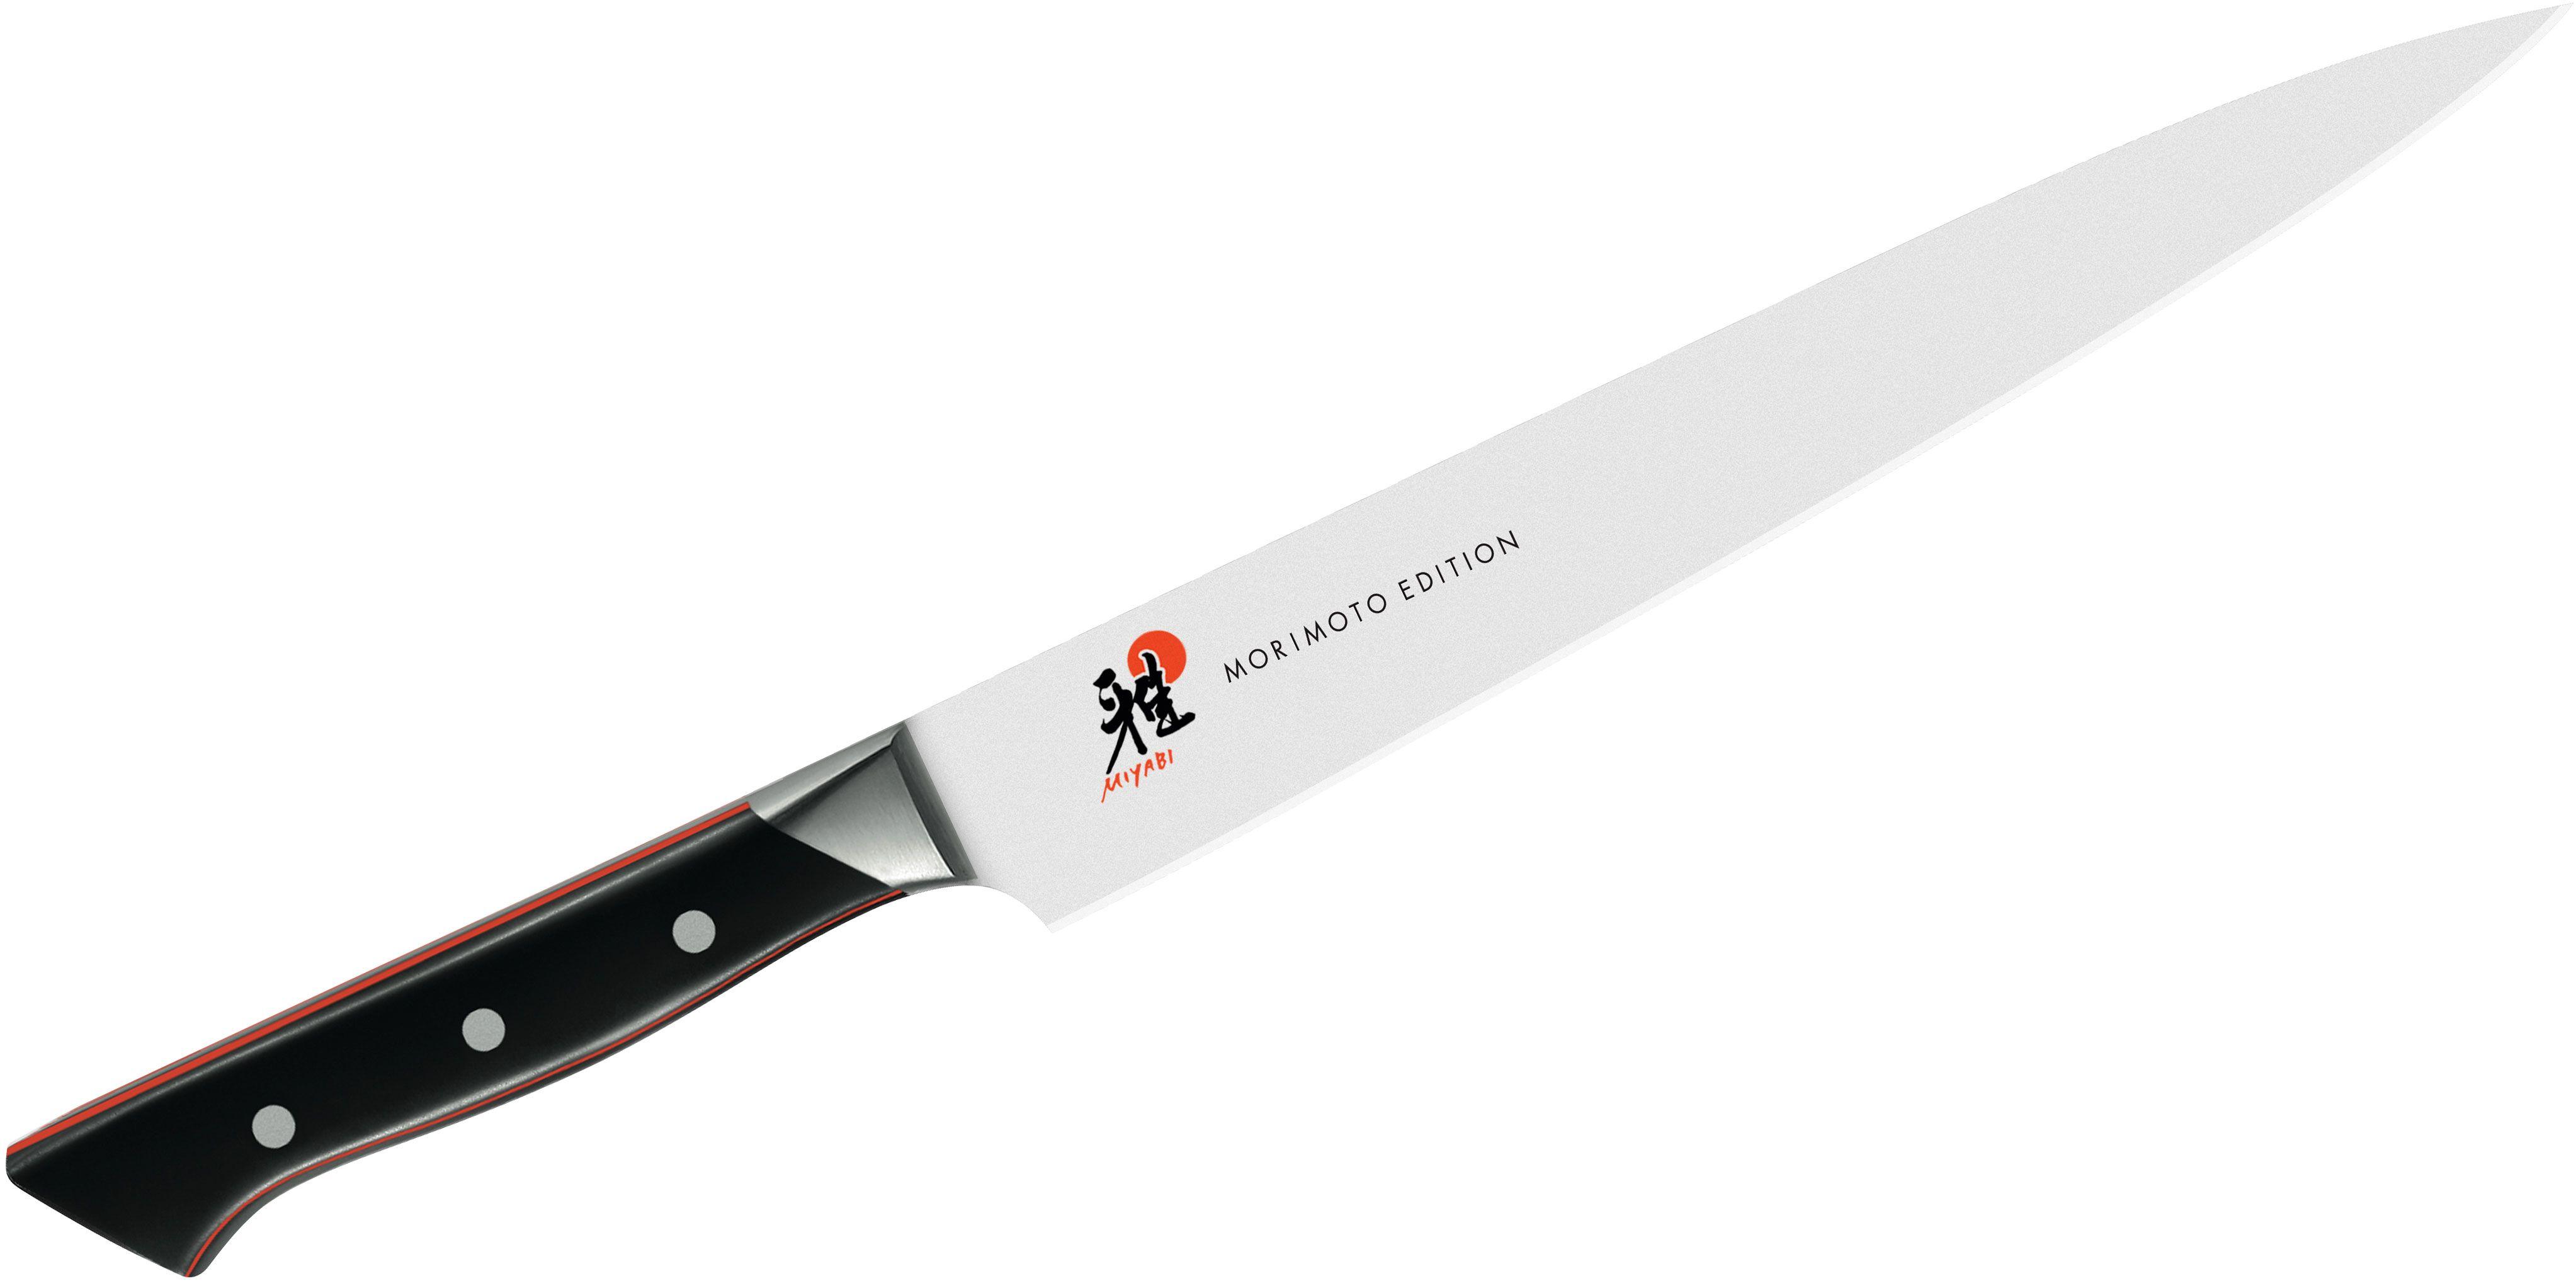 Zwilling J.A. Henckels Miyabi Red 600S Morimoto 9.5 inch Slicing Knife